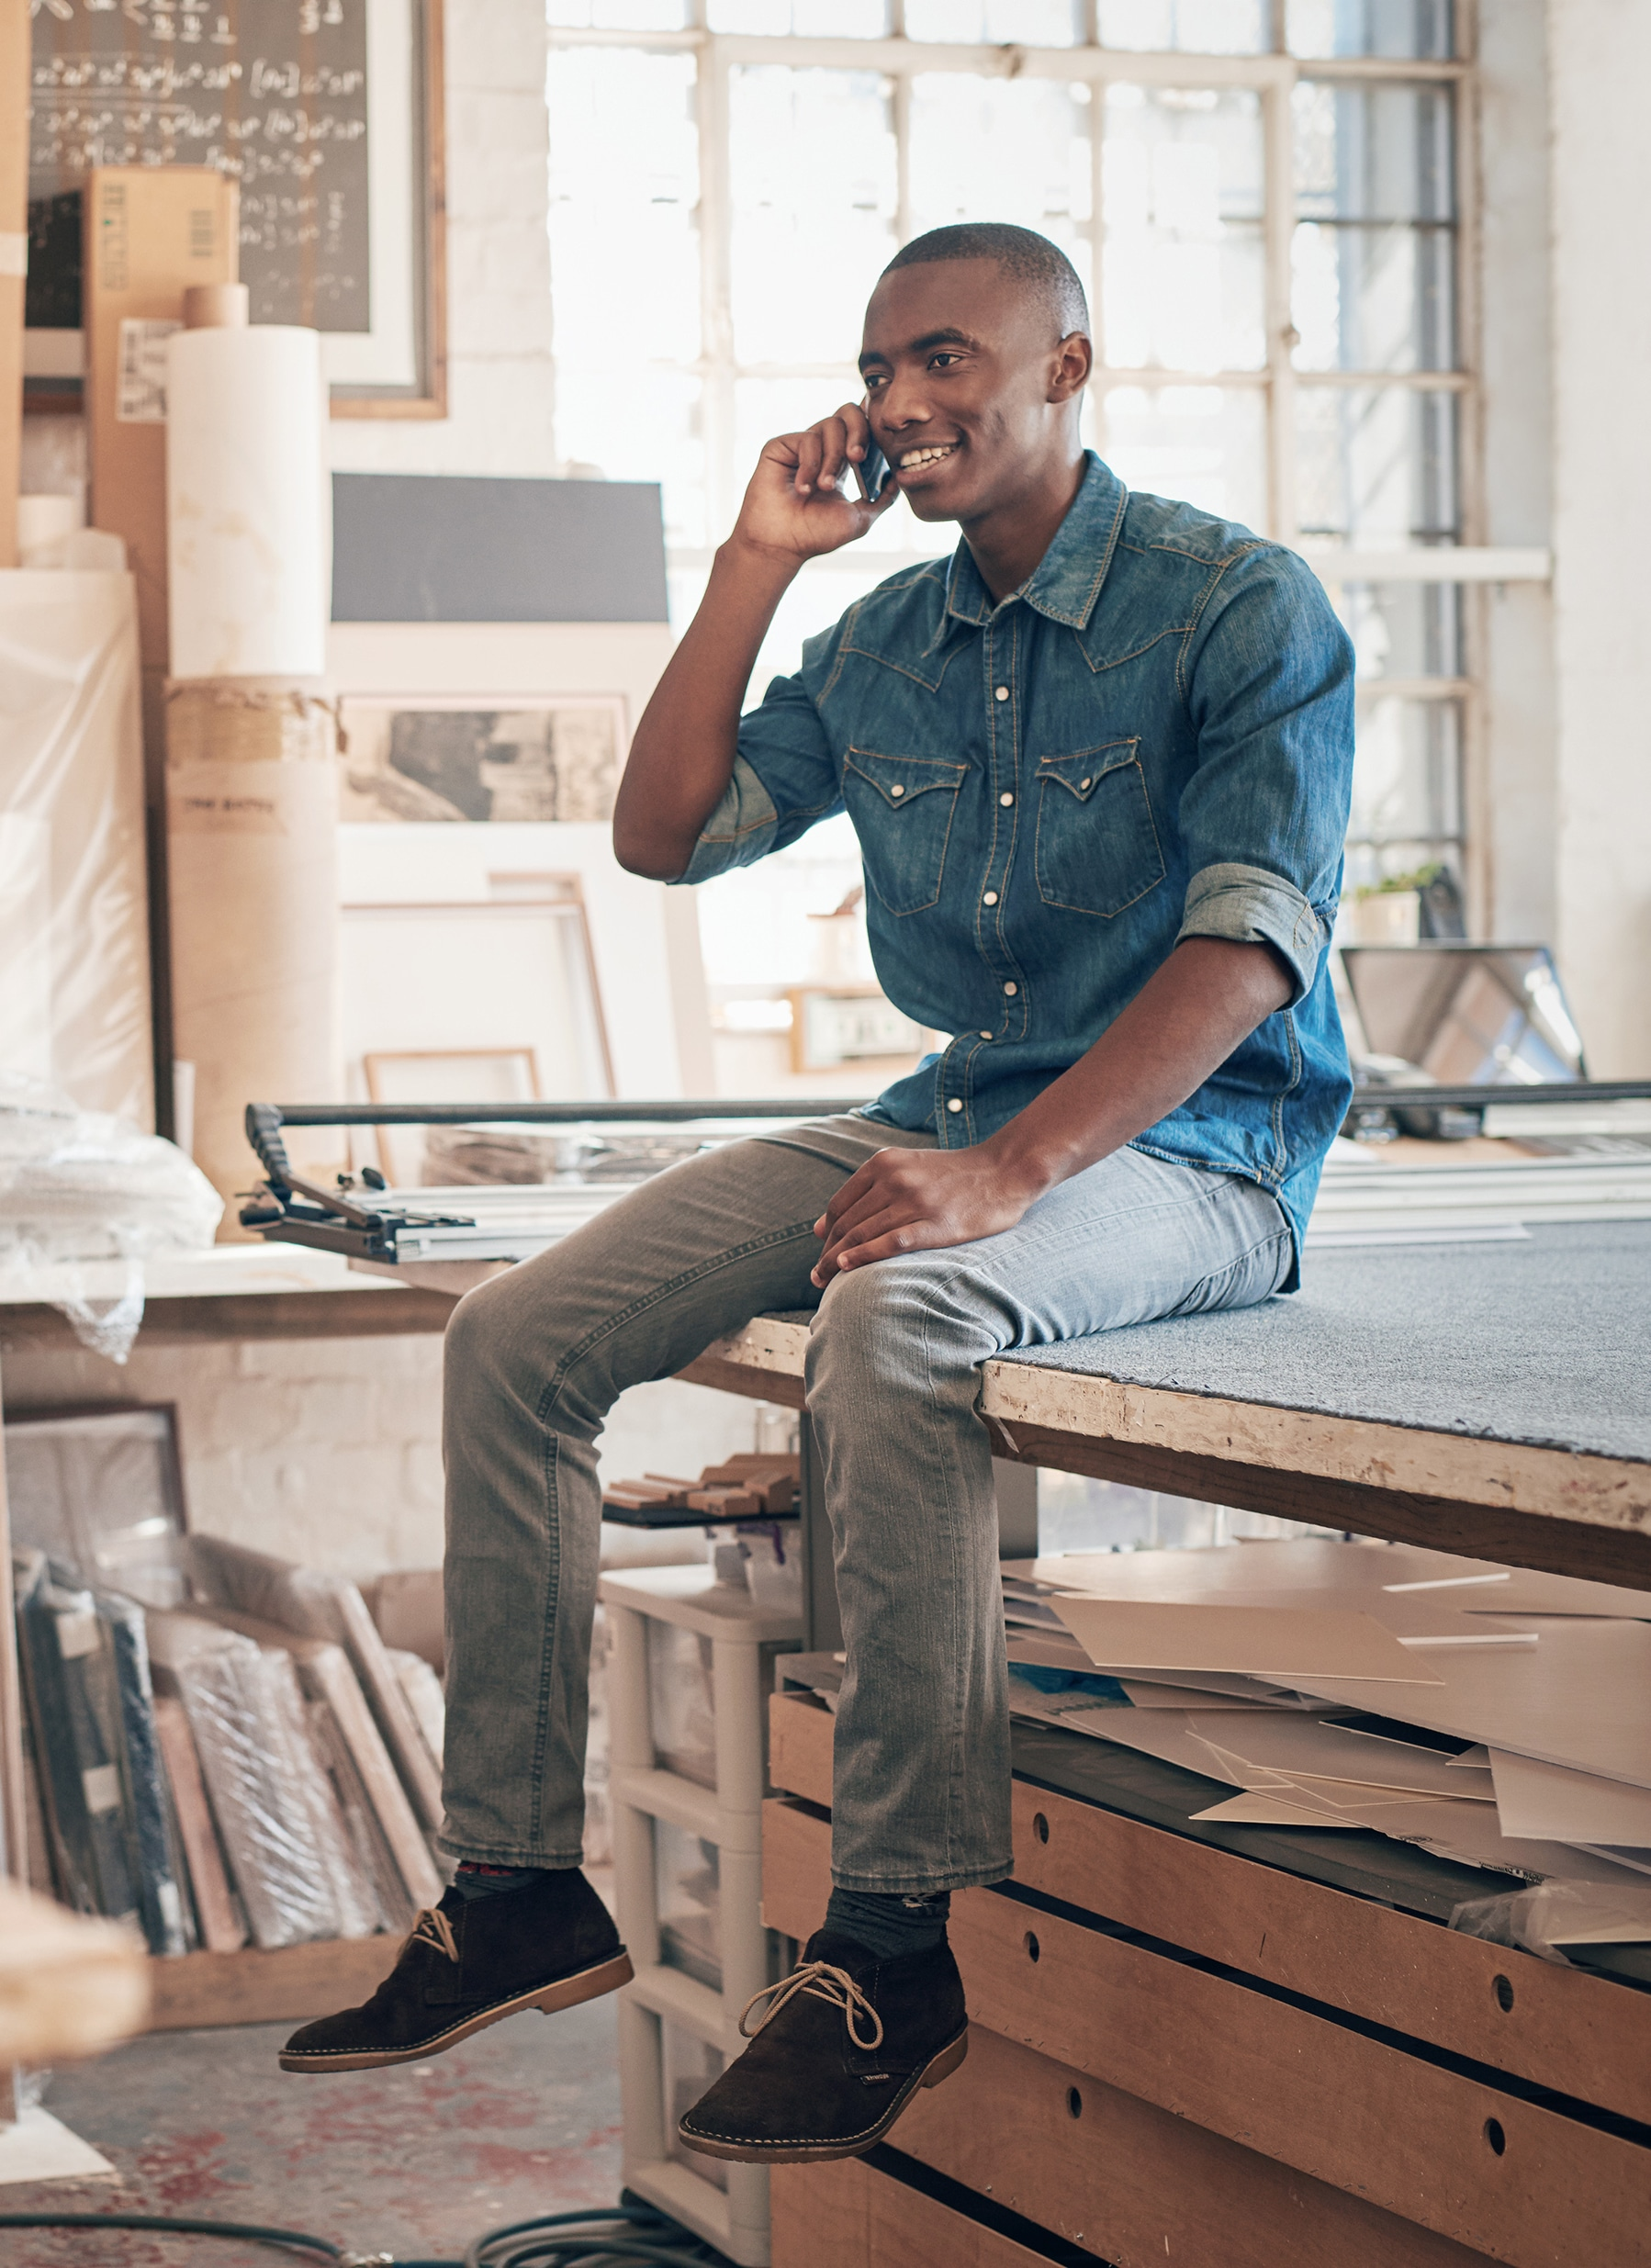 Handsome African designer talking on phone in his studio